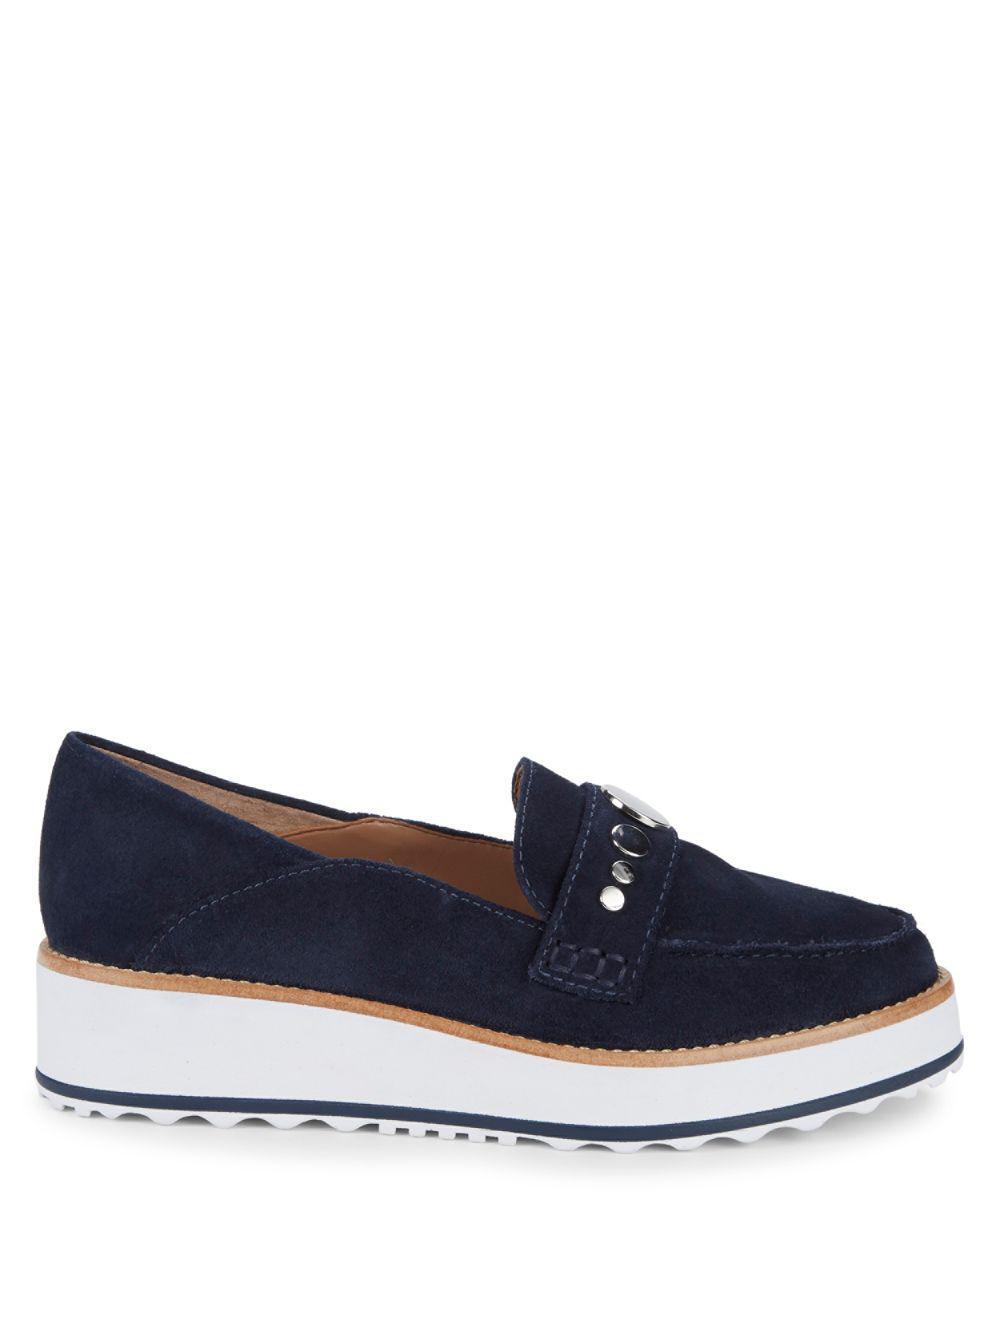 c96825709ea Bernardo - Blue Suede Platform Loafers - Lyst. View fullscreen